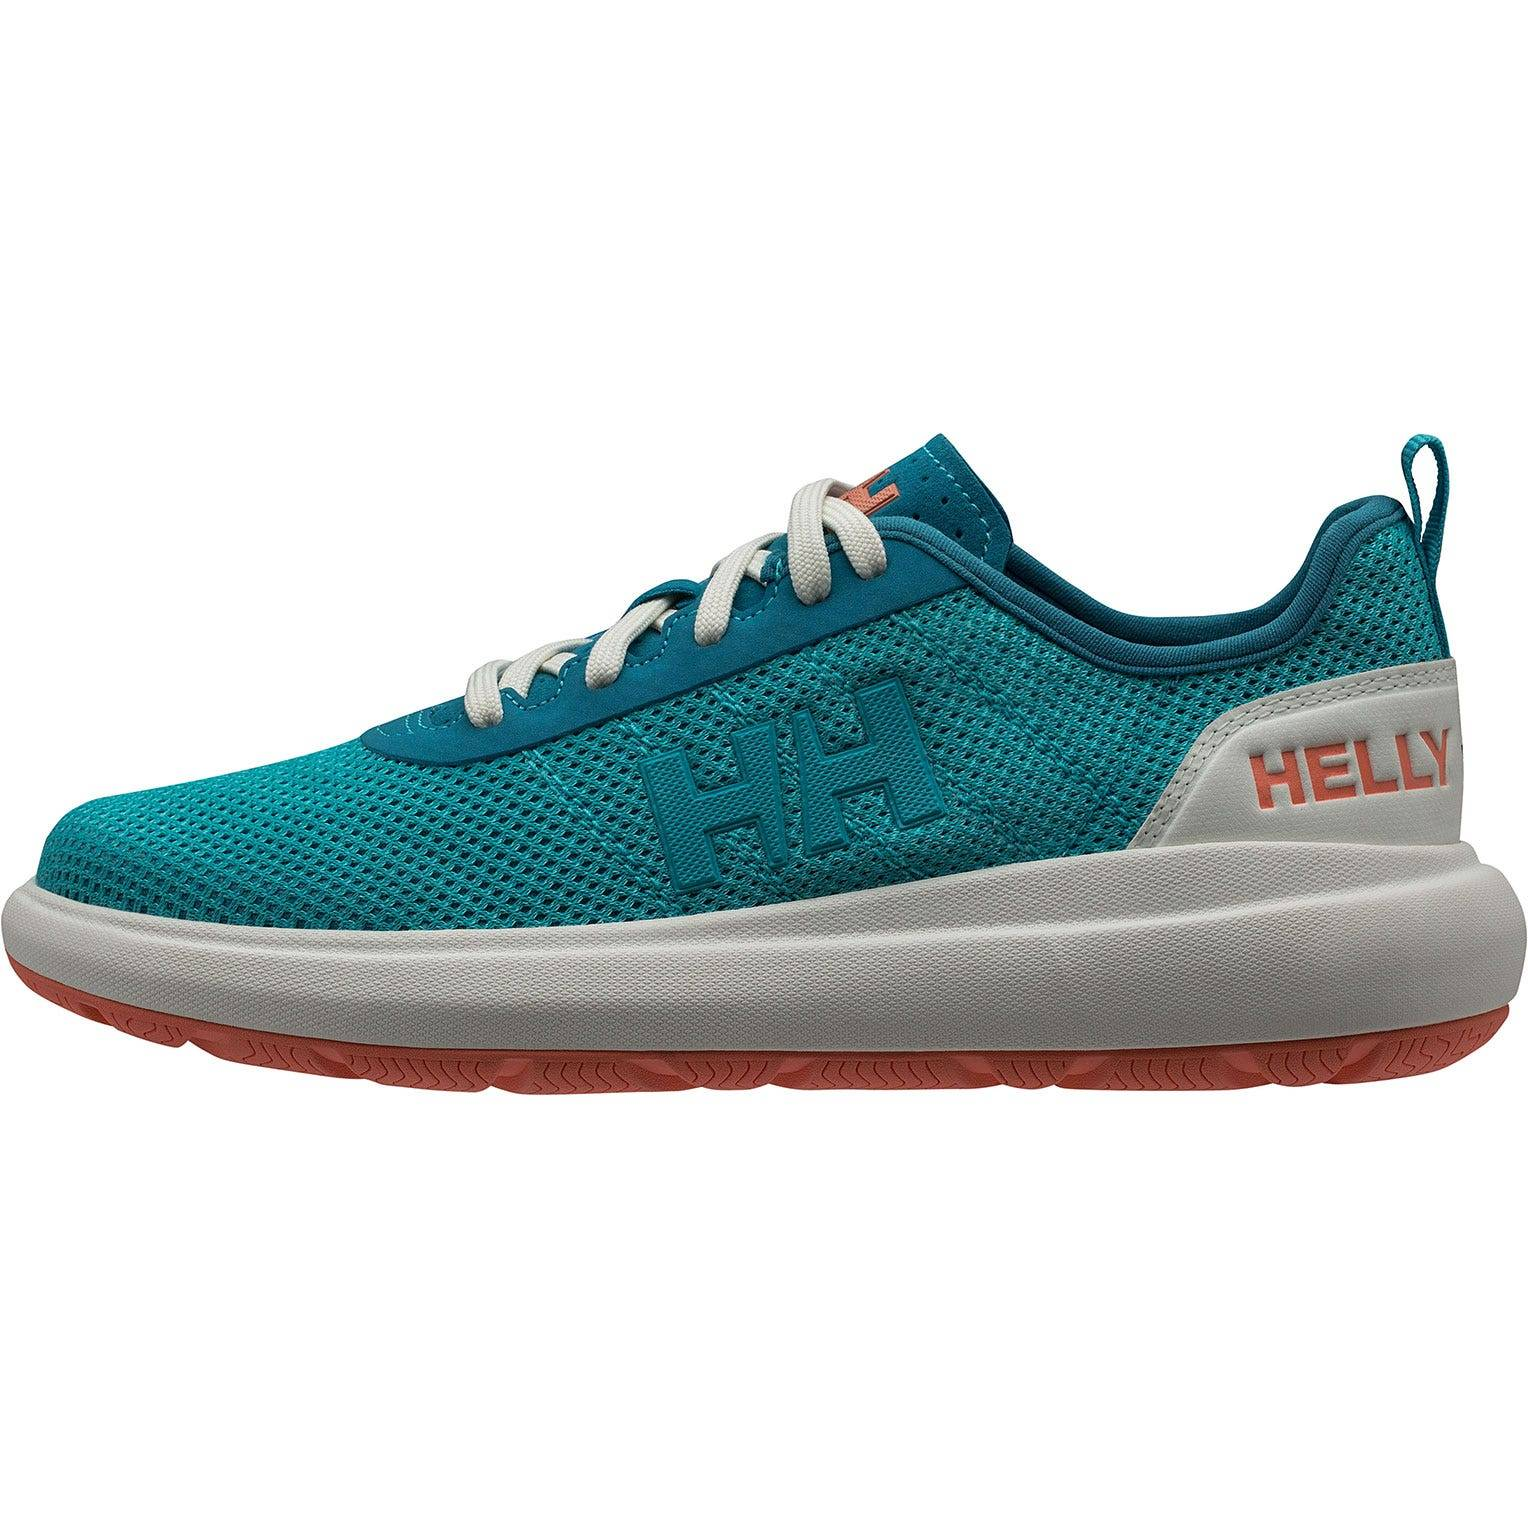 Helly Hansen W Spindrift Shoe Womens Casual Blue 41/9.5